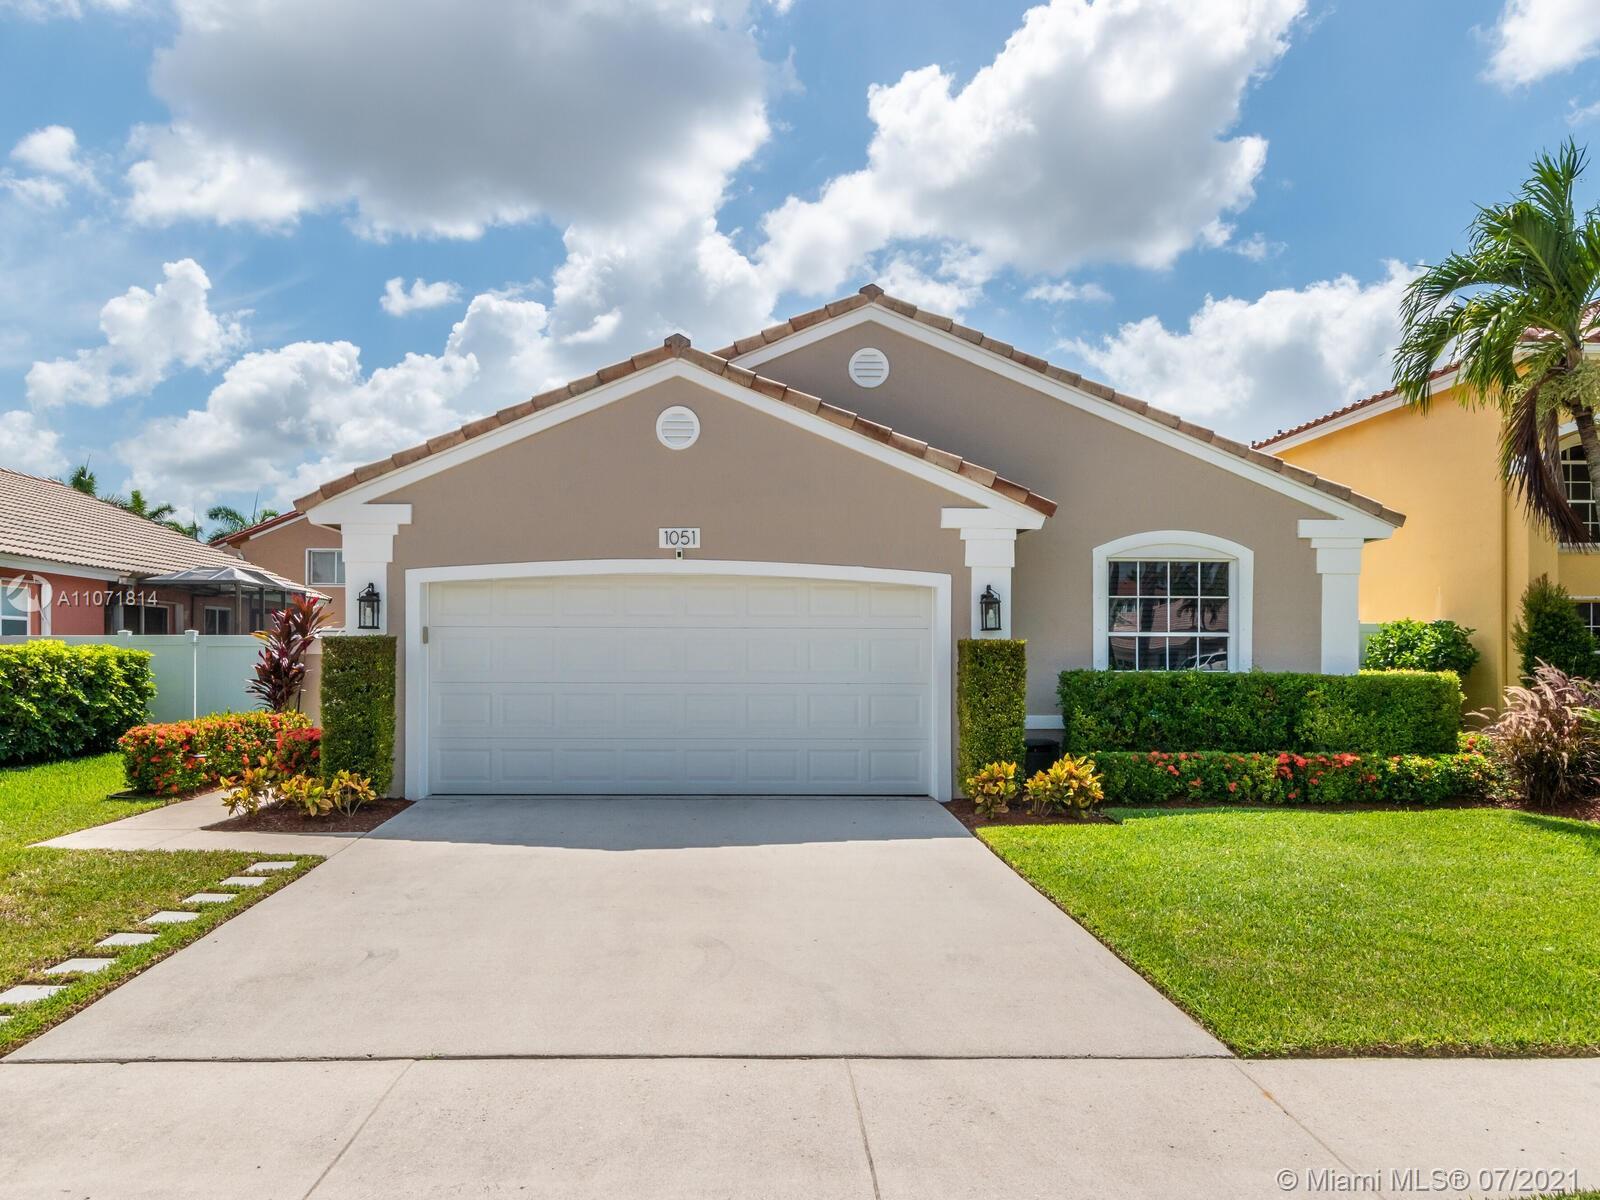 Ameritrail - 1051 NW 189th Ave, Pembroke Pines, FL 33029